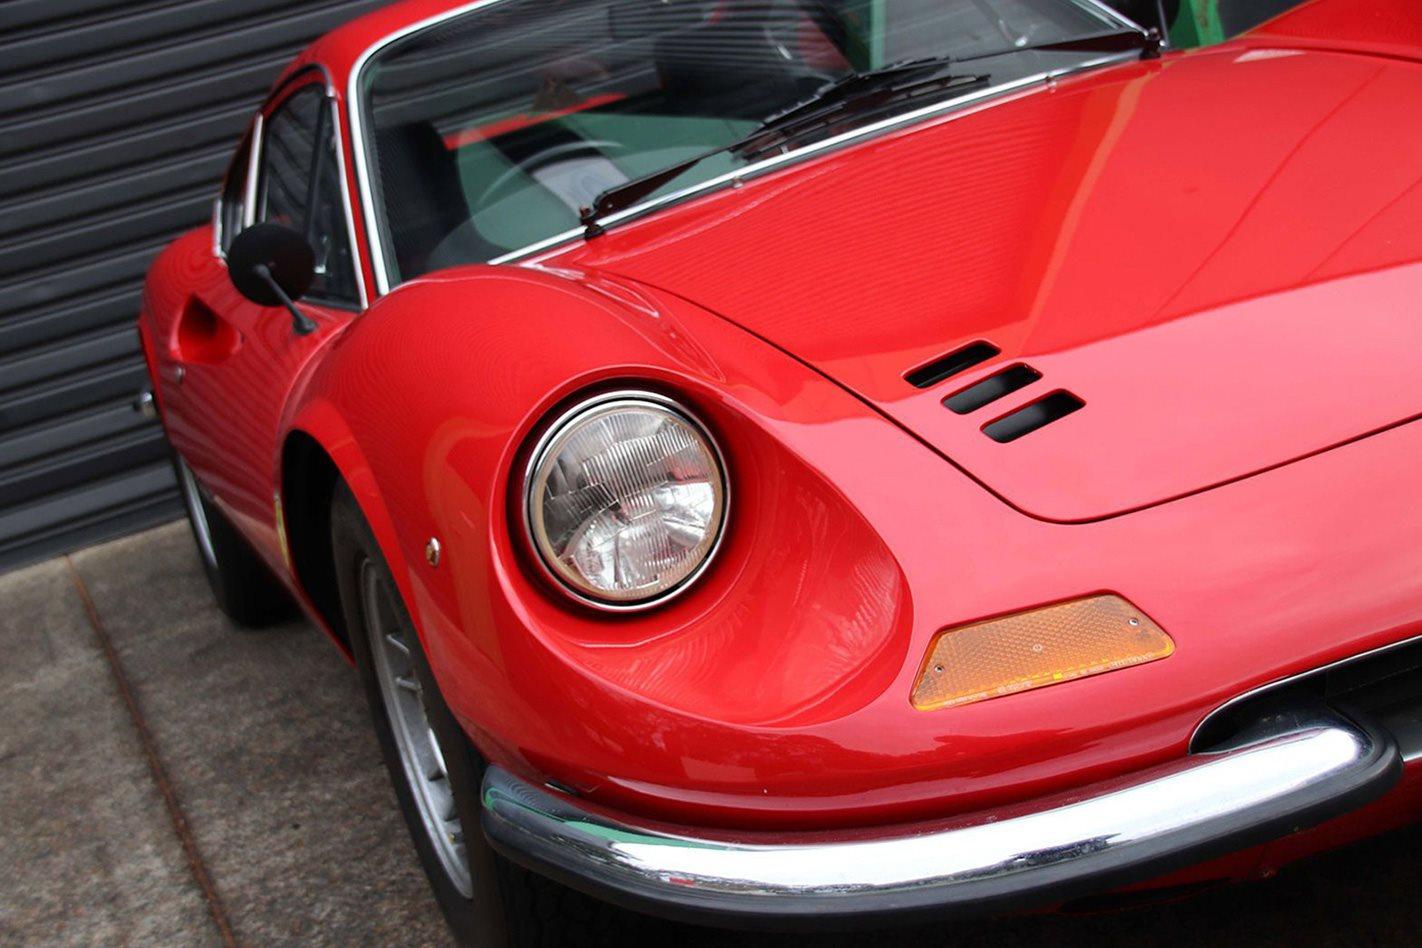 1972-Ferrari-246GT-Dino-coupe-front.jpg